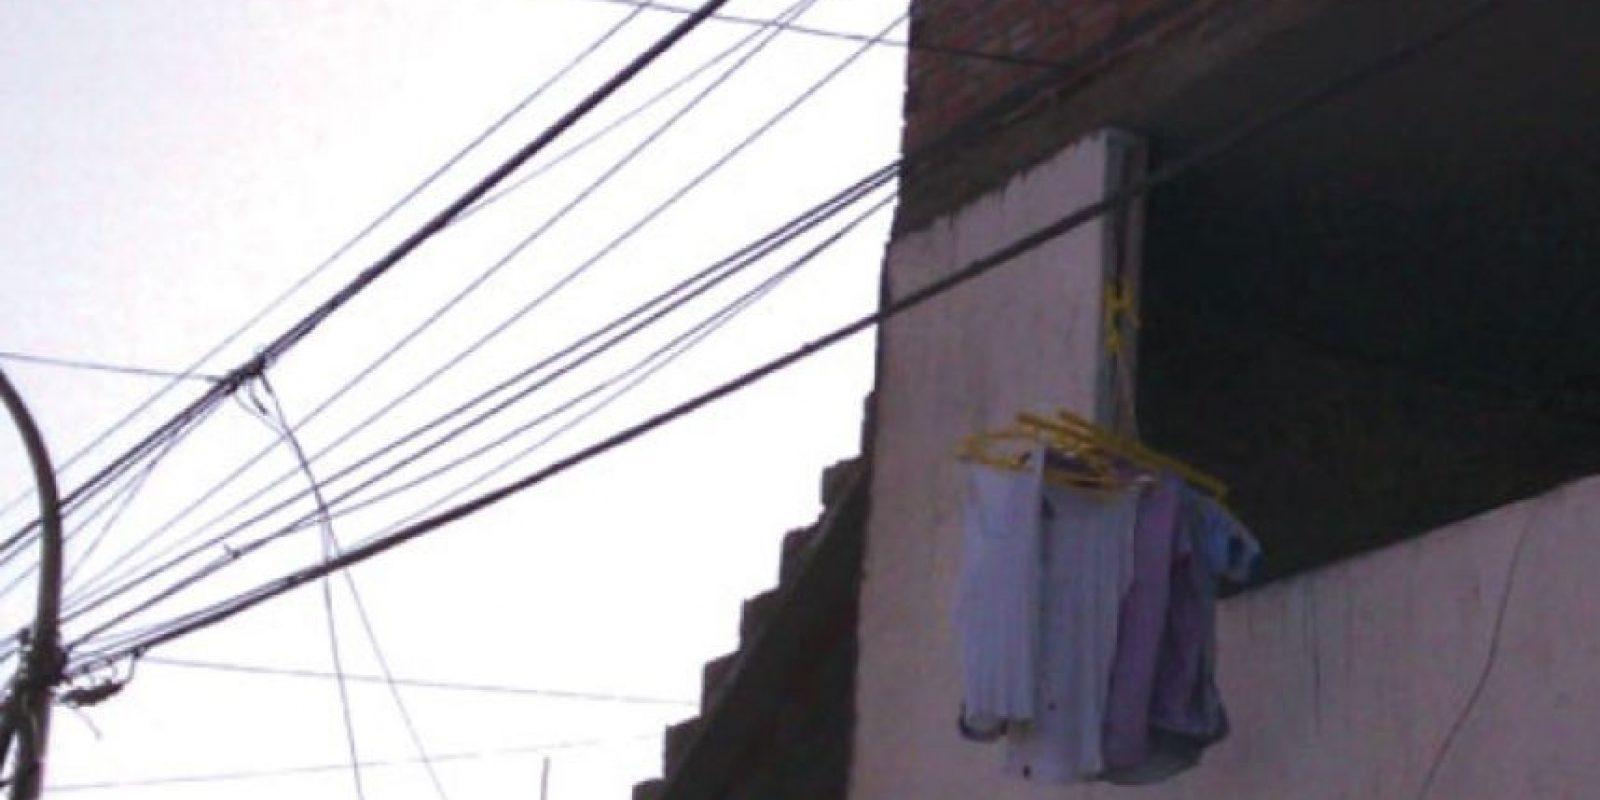 ¡Seguro así, sí se seca la ropa! Foto:Know Your Meme